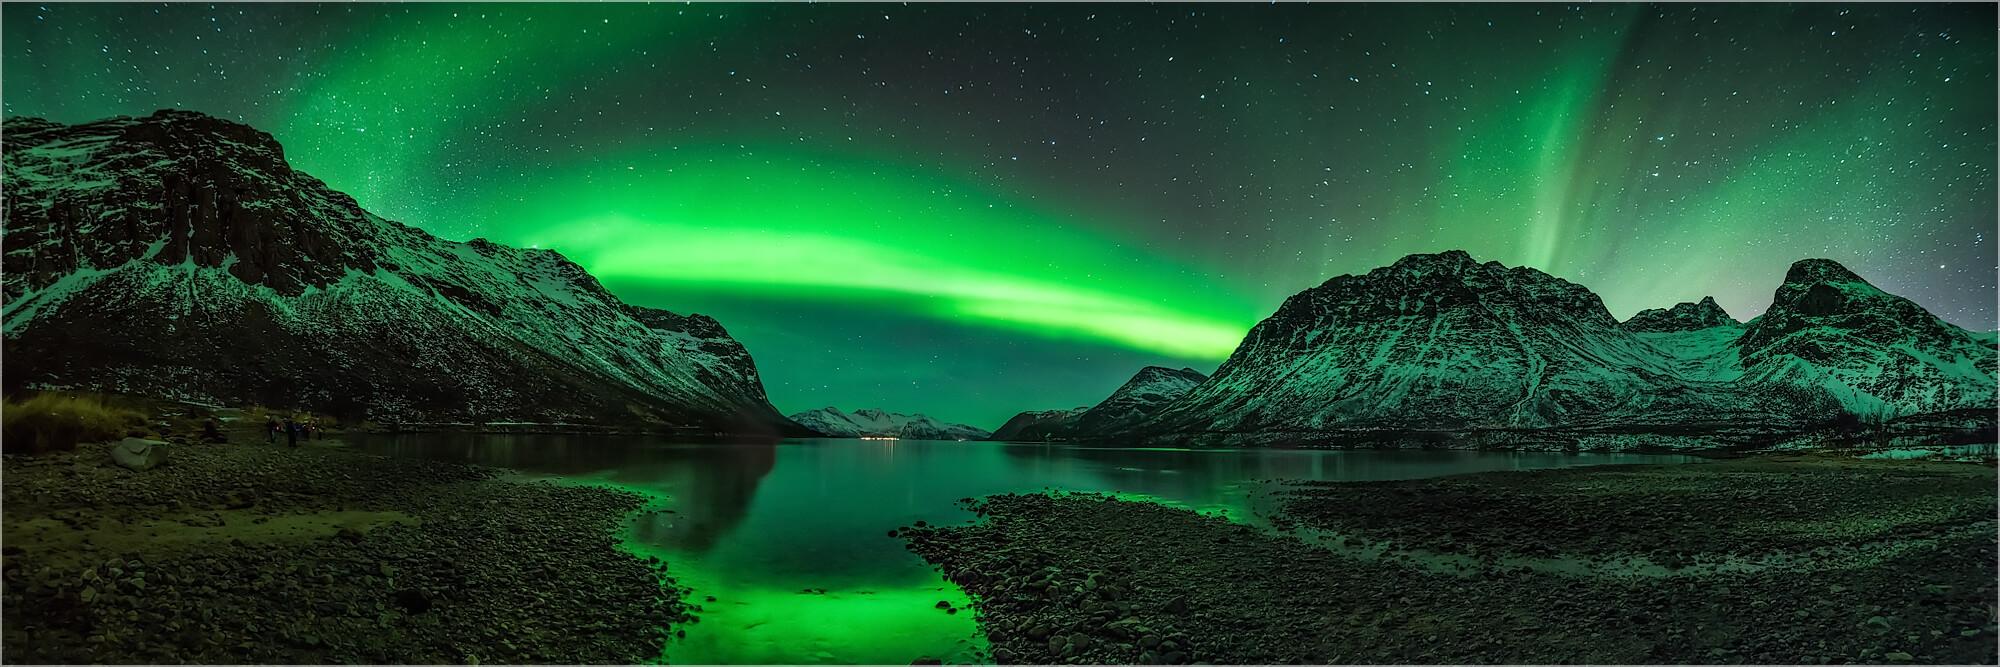 Panoramabild Aurora Borealis Polarlicht in Norwegen